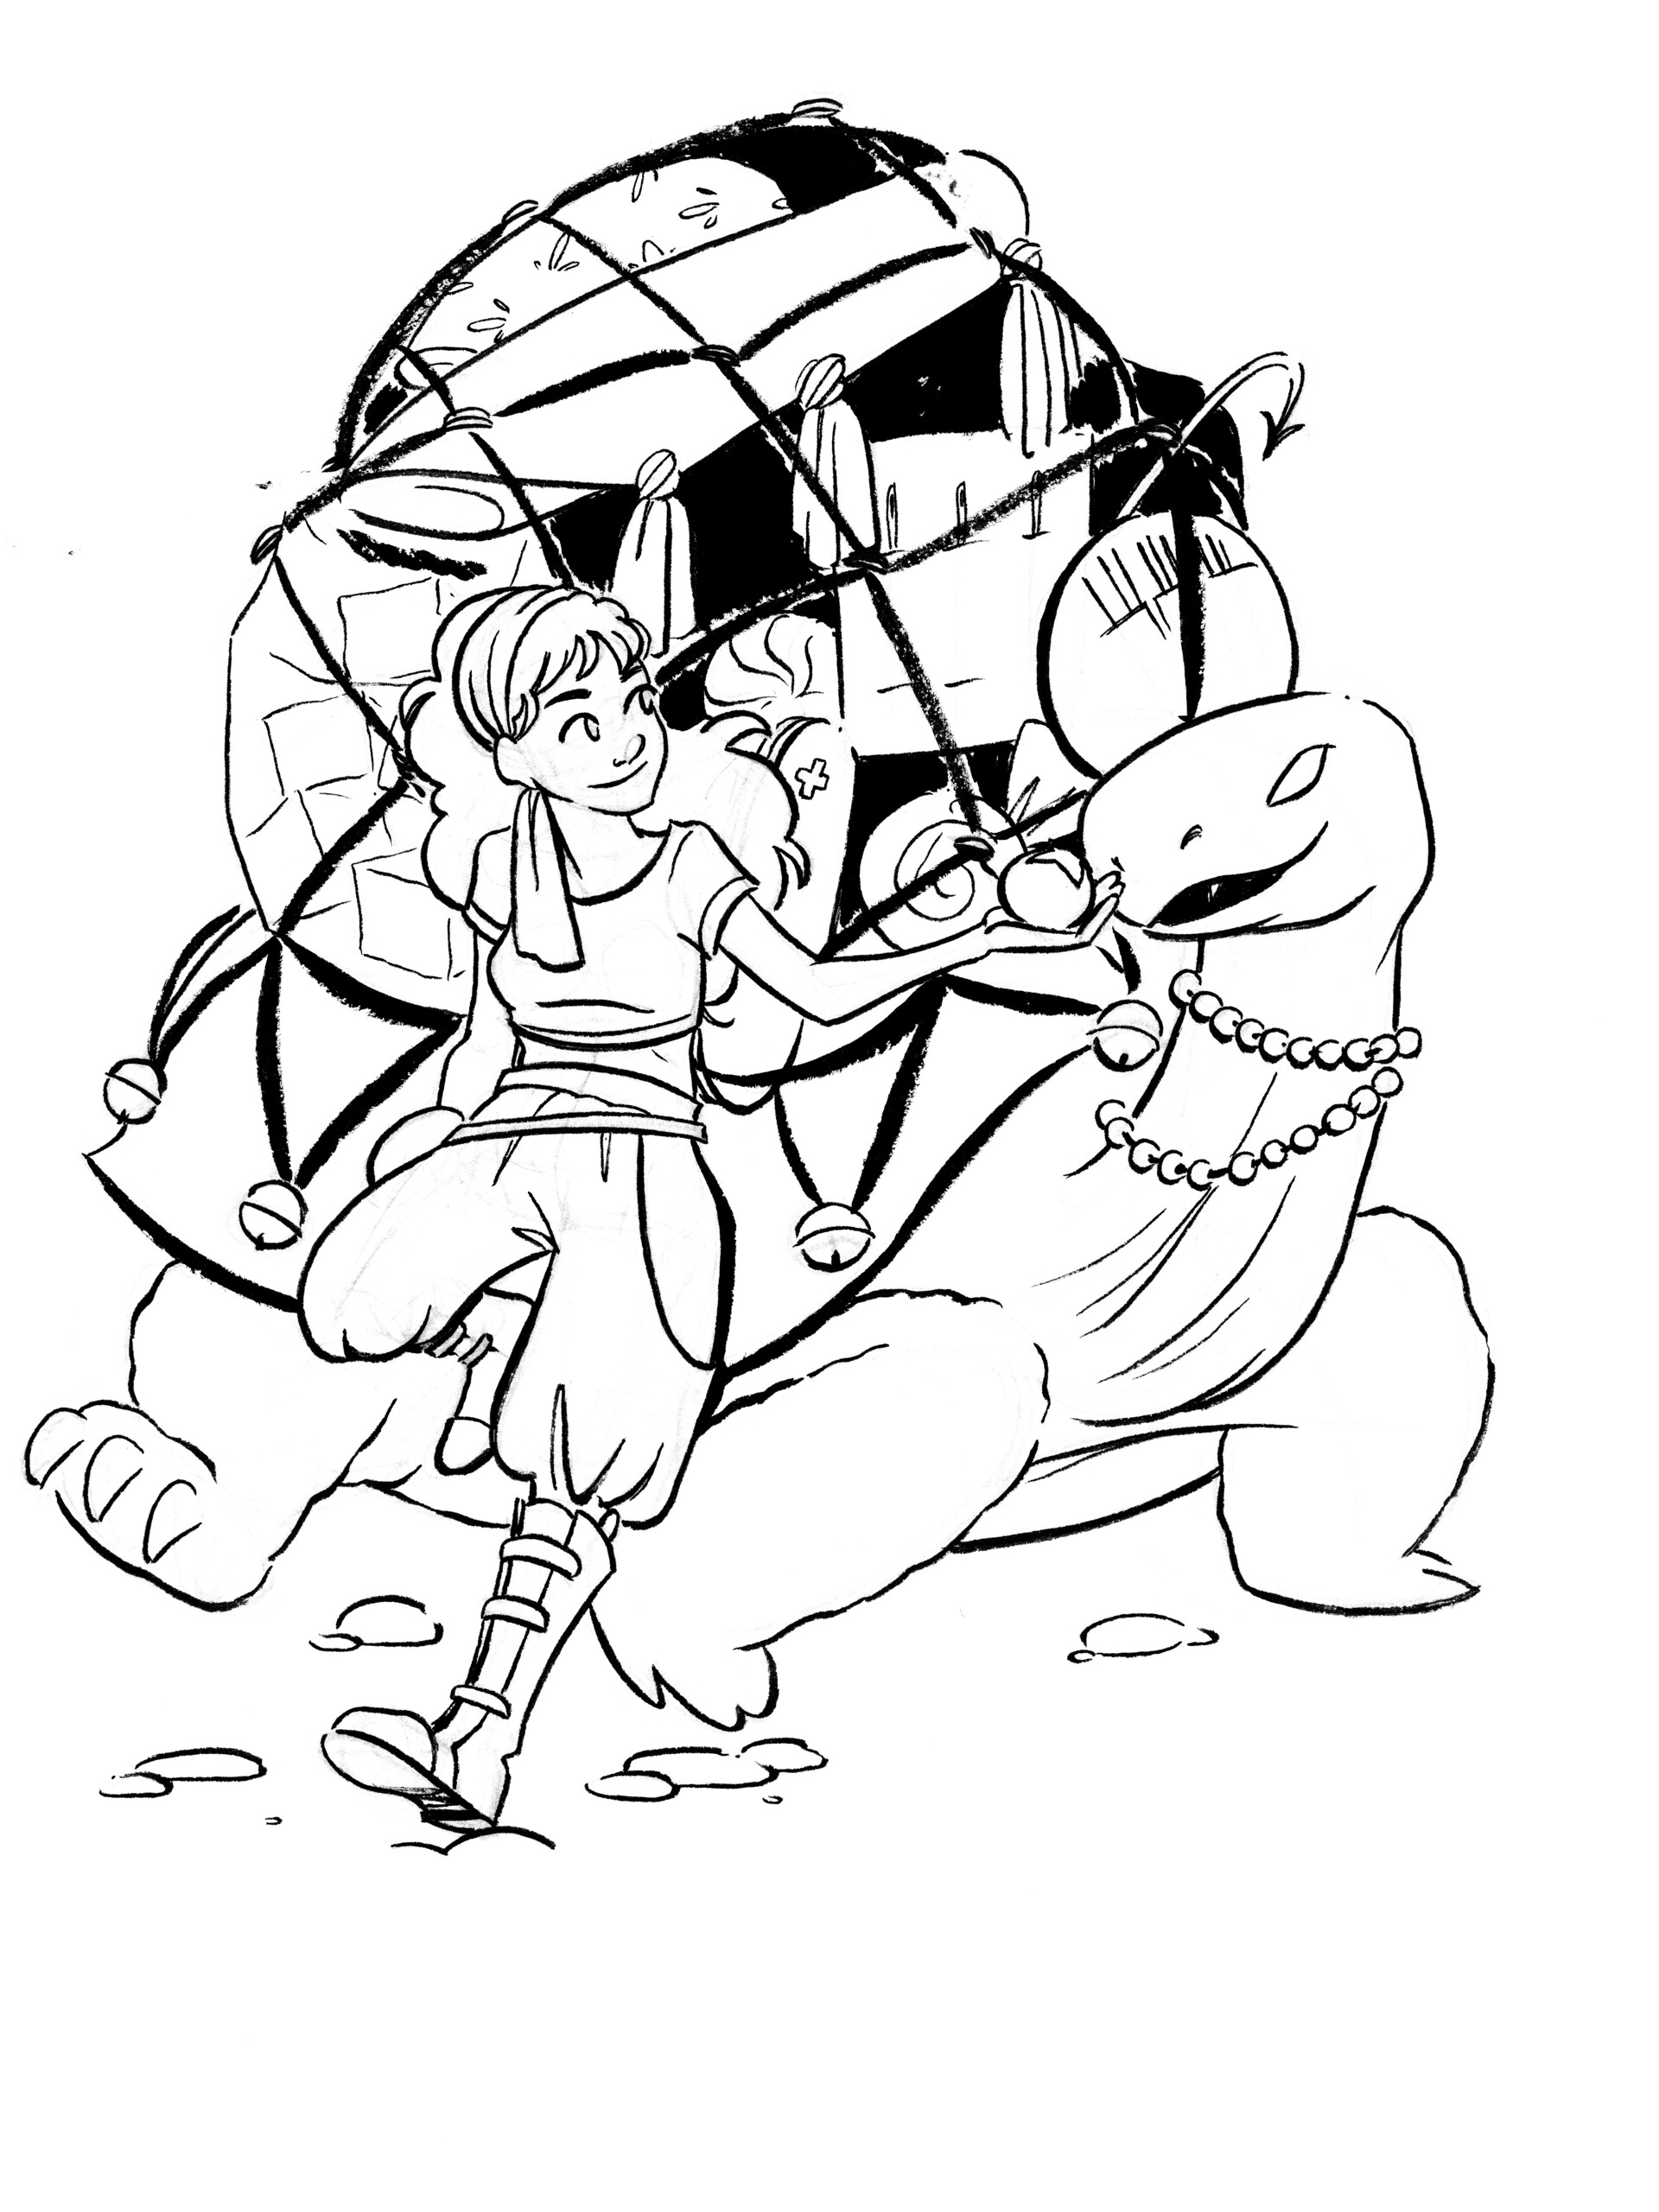 Inked sketch originally created in October 2017.